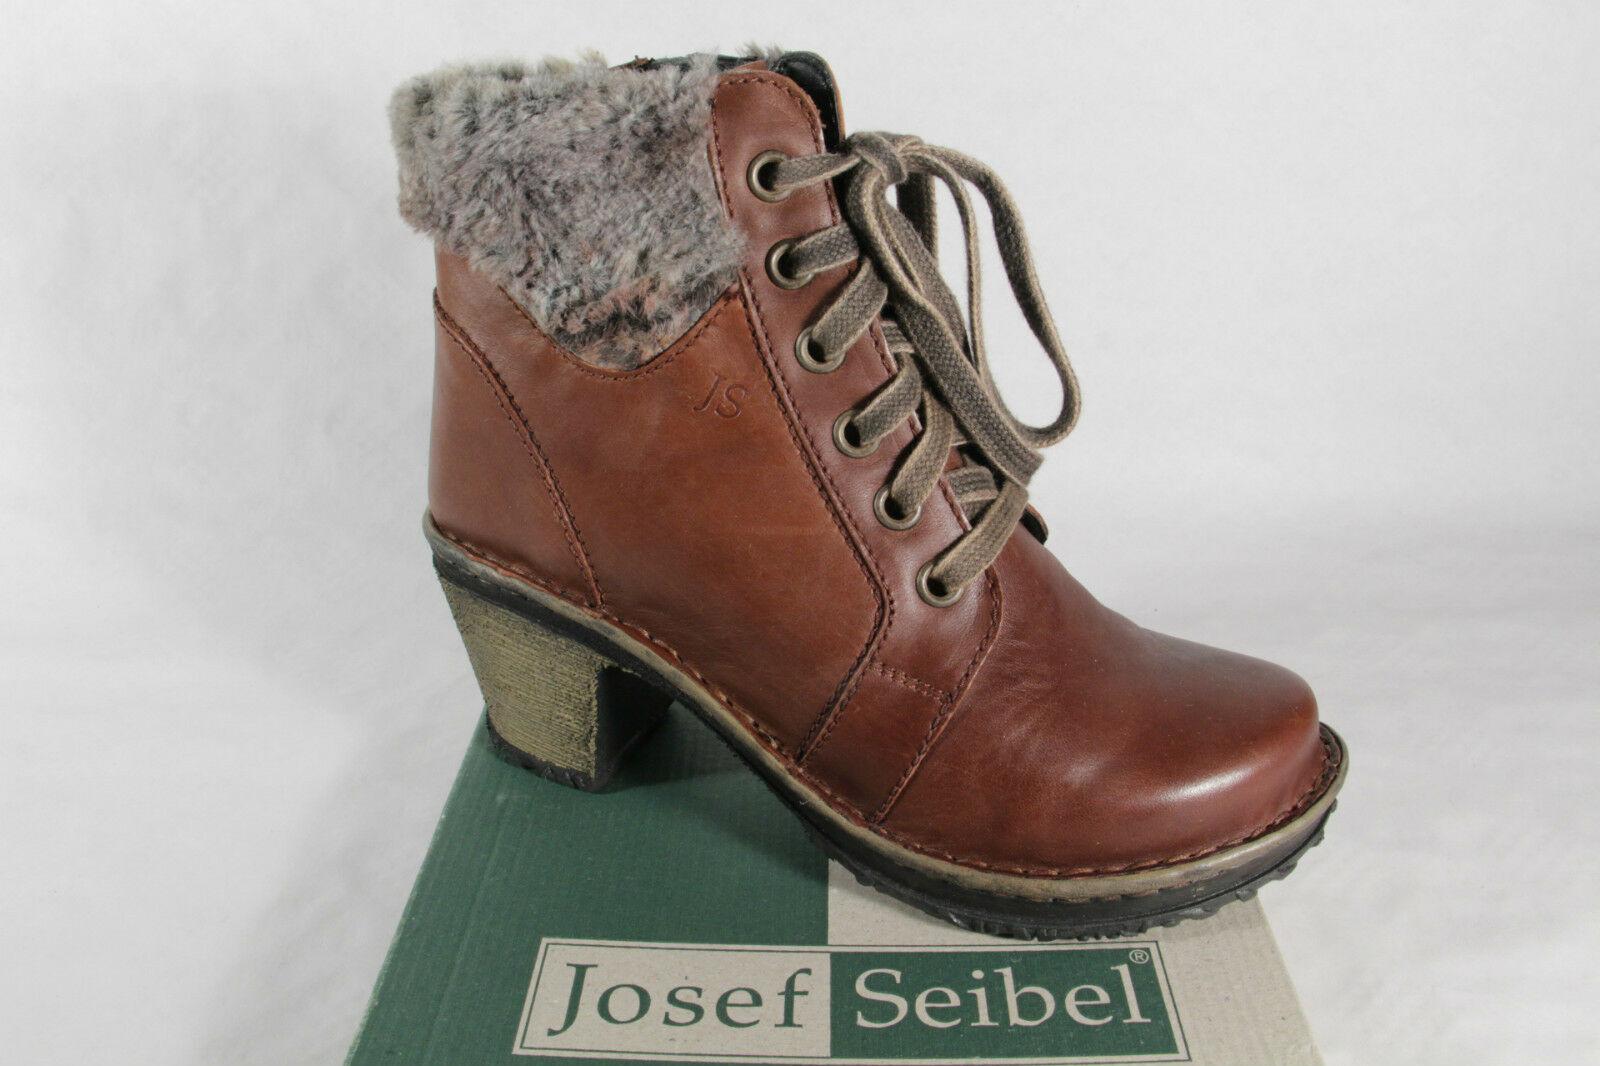 Josef Seibel Stiefel, Stiefelette, Schnürstiefel mit RV, braun, gefüttert, gefüttert, gefüttert, NEU c494c6